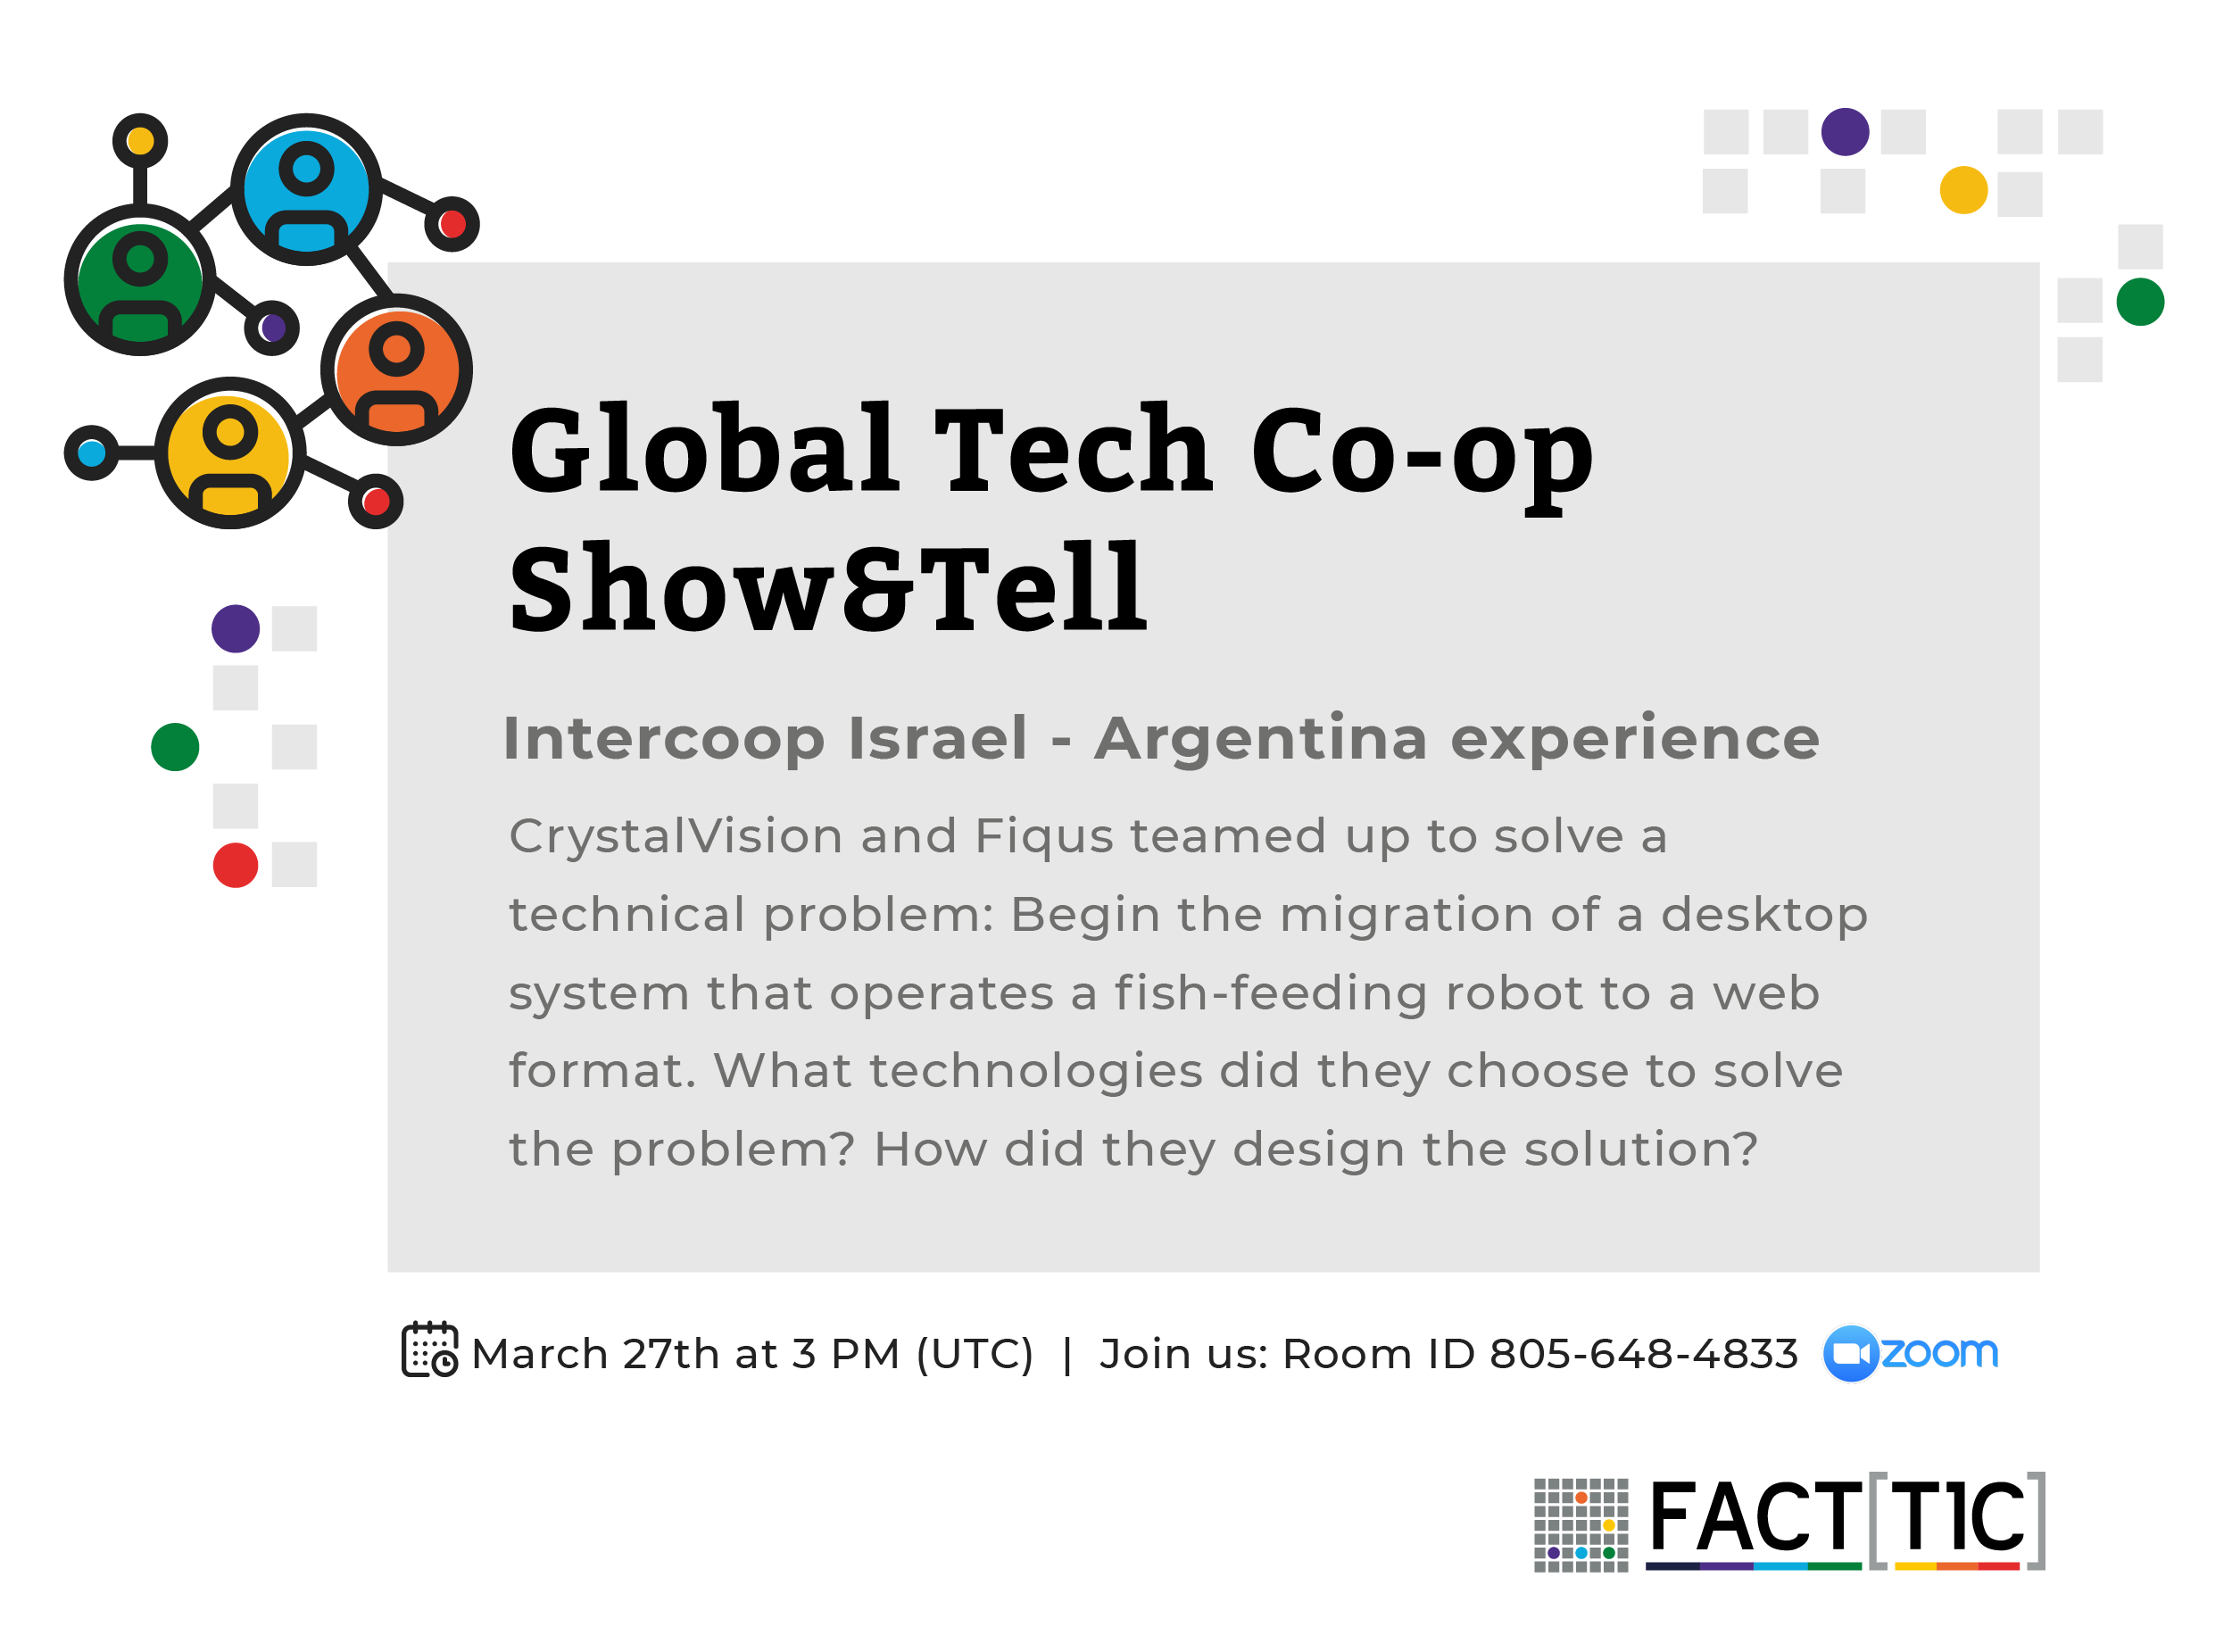 2020_03_19_FACTTIC_Show and tell_Invitación